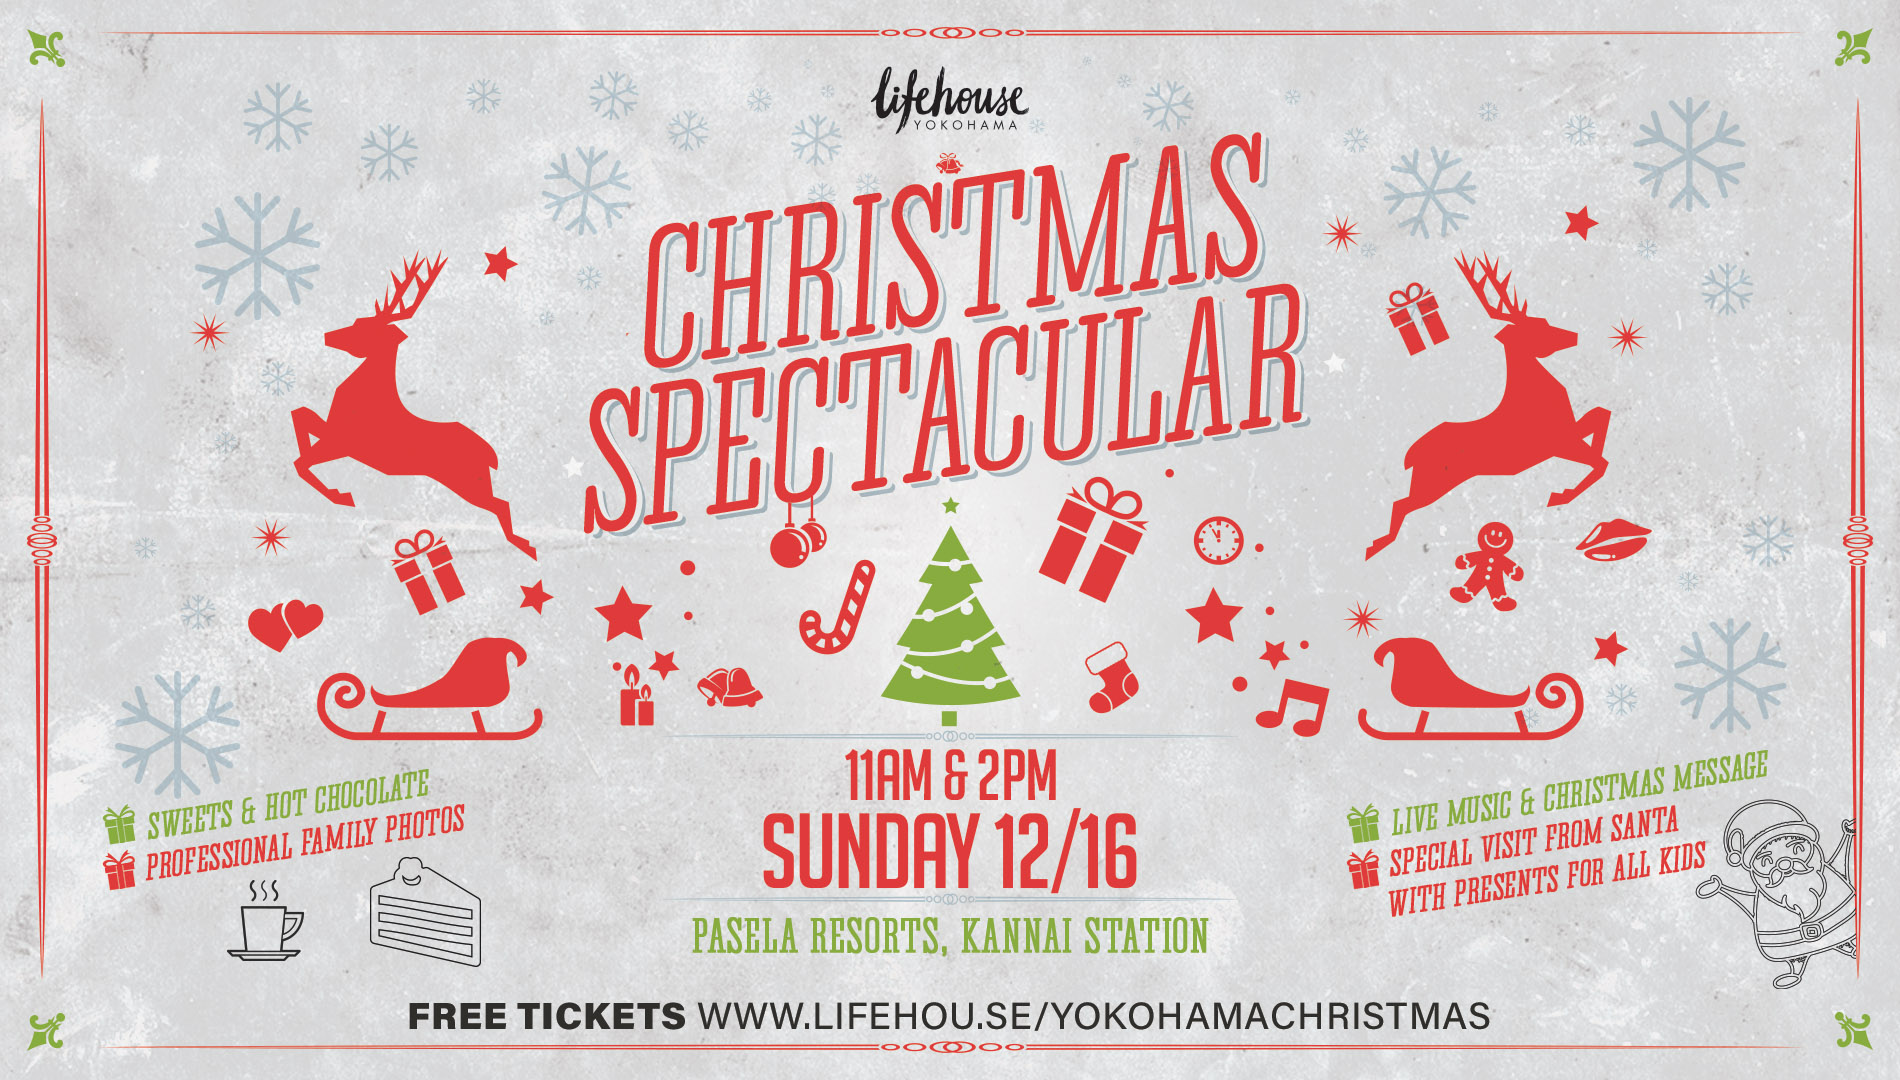 Yokohama Christmas Spectacular 2018 Tickets, Sun, Dec 16, 2018 at 10 ...